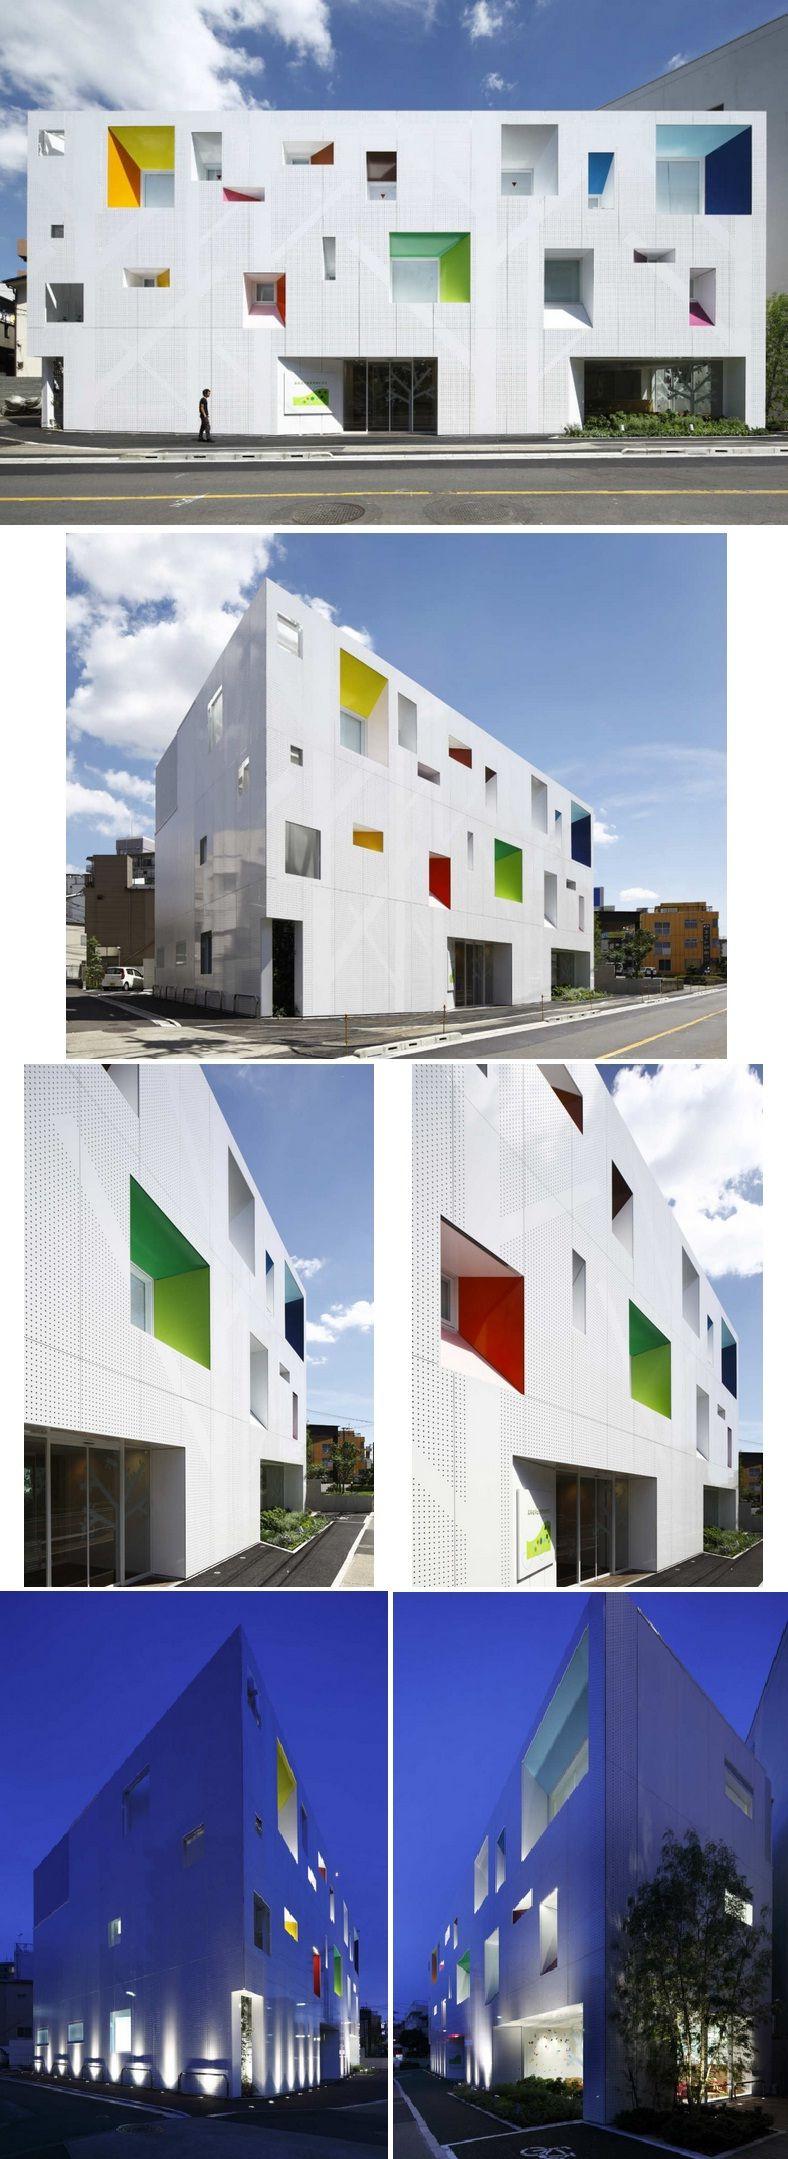 Sugamo Shinkin Bank, Tokiwadai Branch / Emmanuelle Moureaux Architecture +  Design